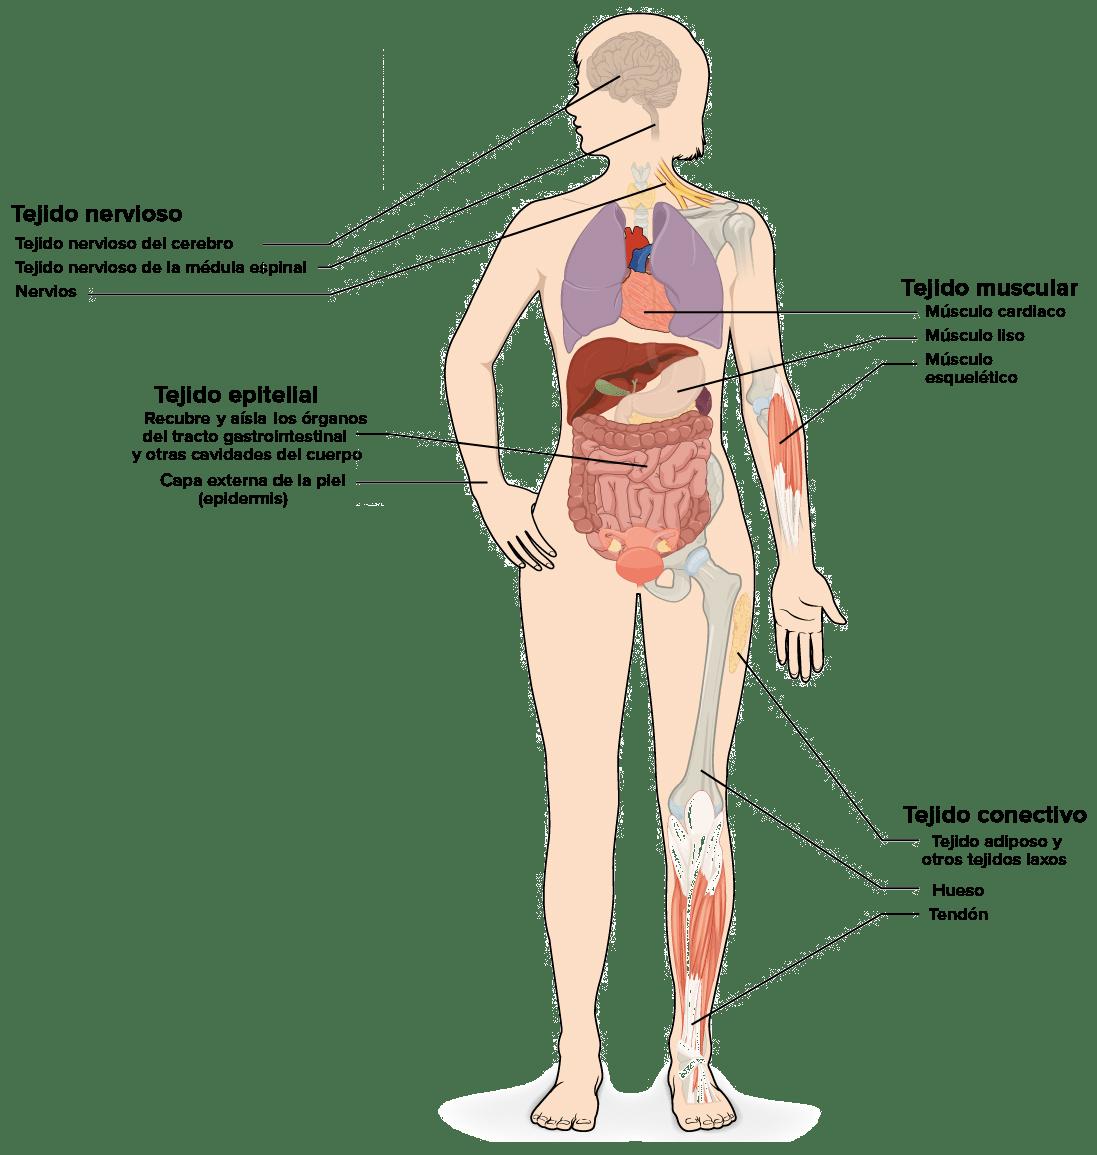 Musculos Del Cuerpo Humano Dibujo